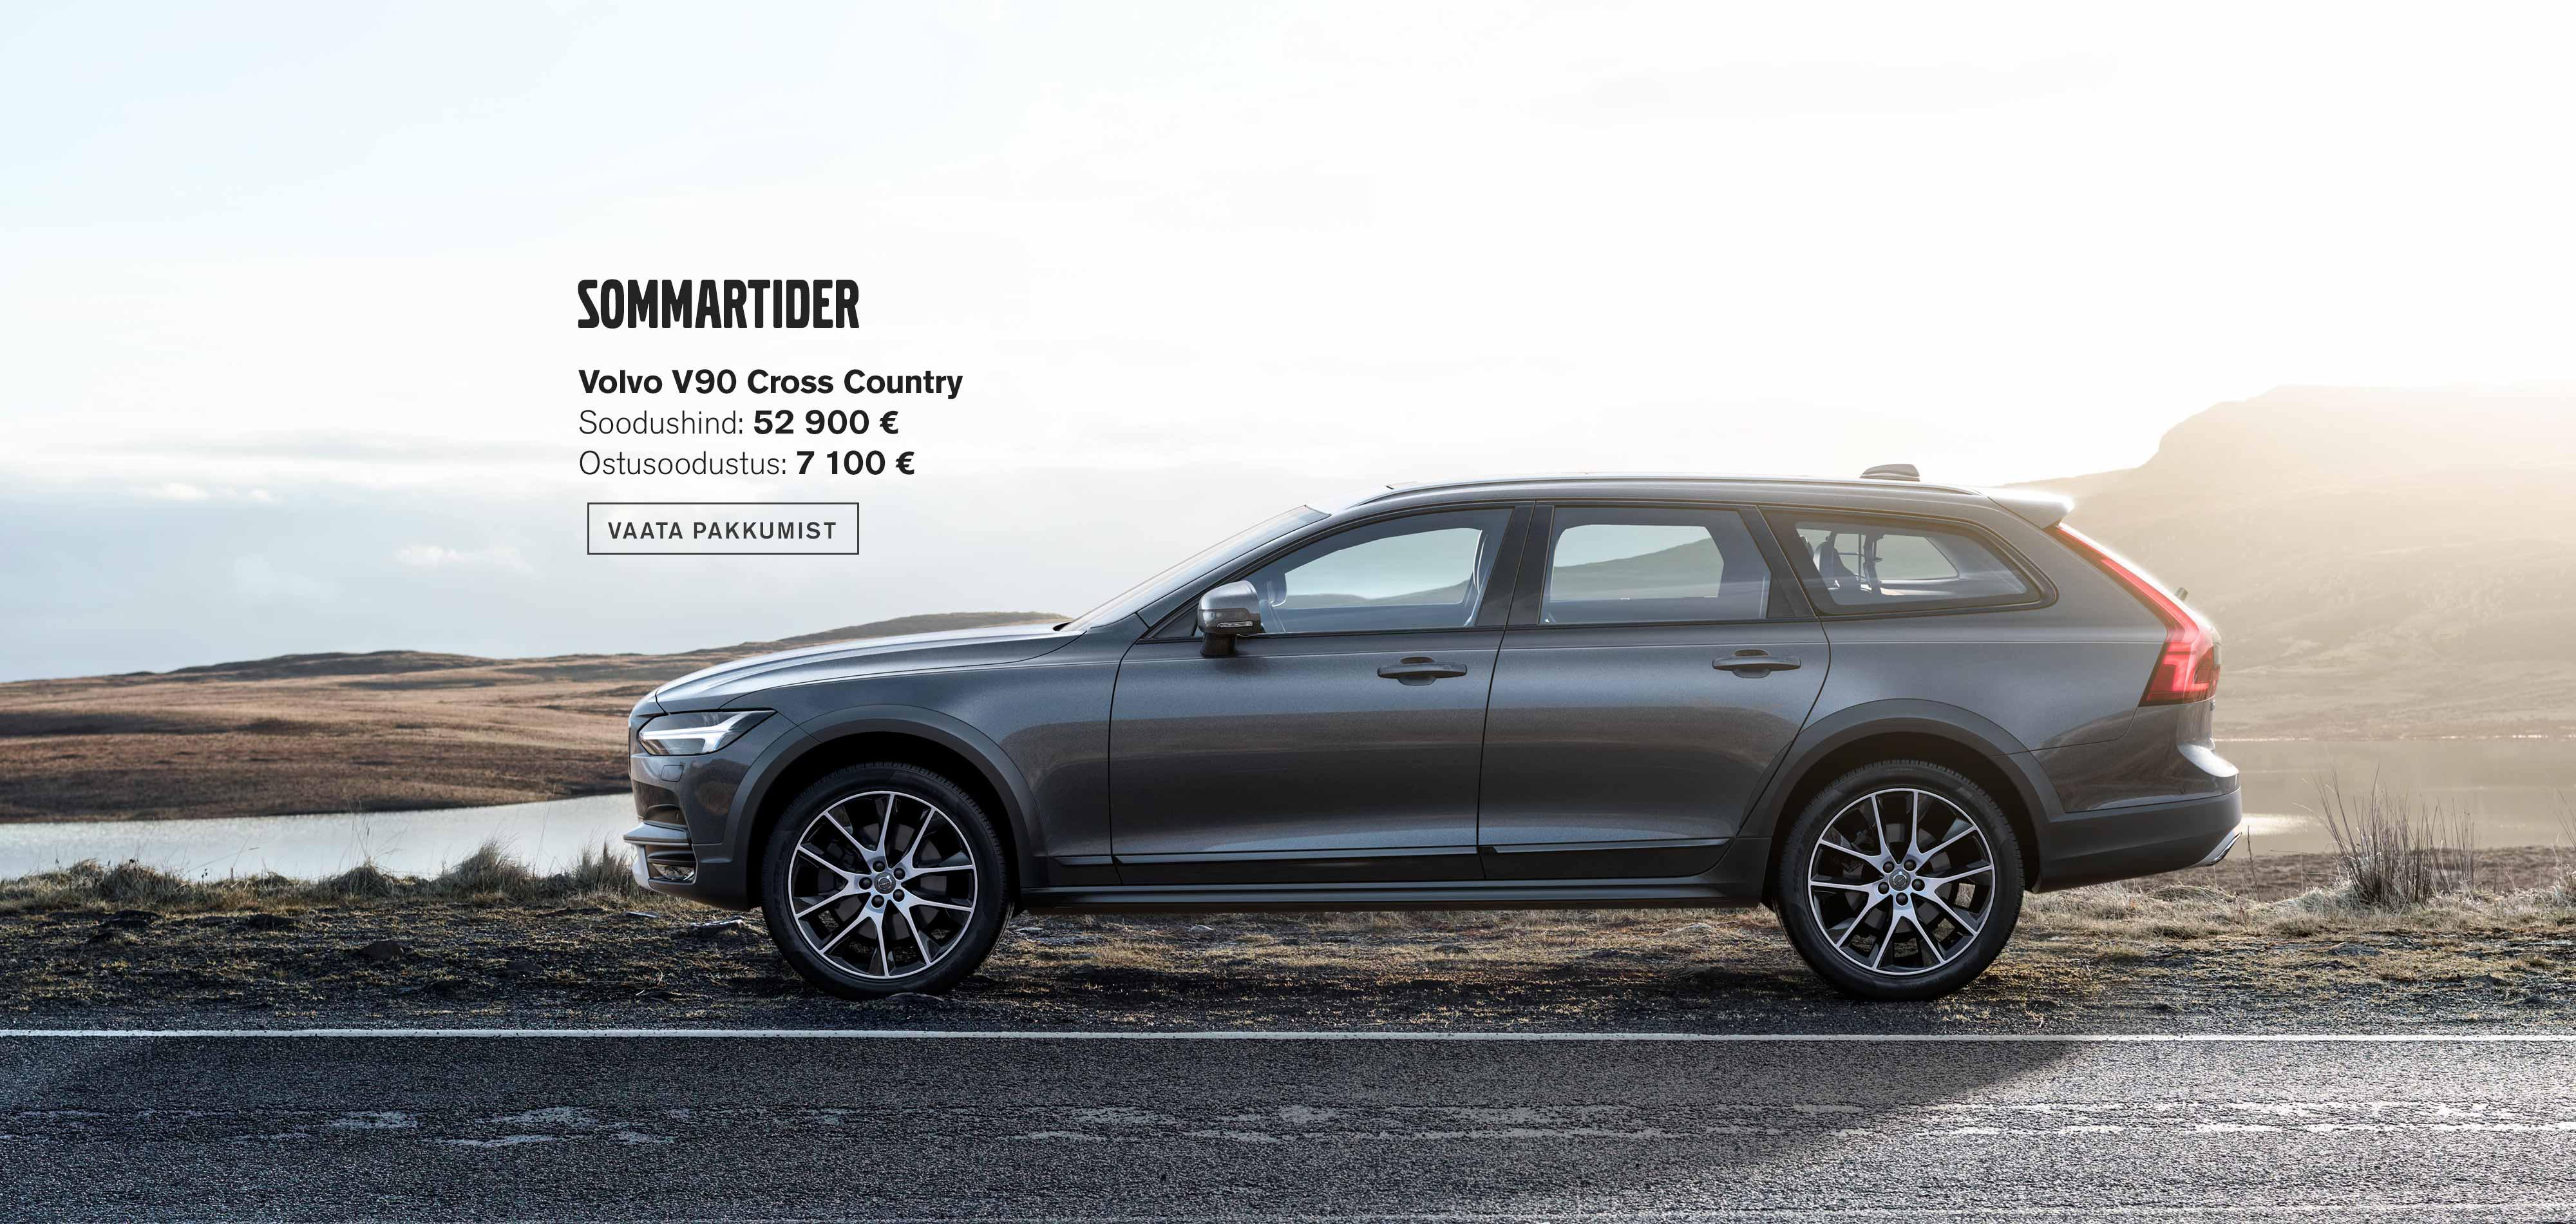 Sommartider - Volvo V90 Cross Country